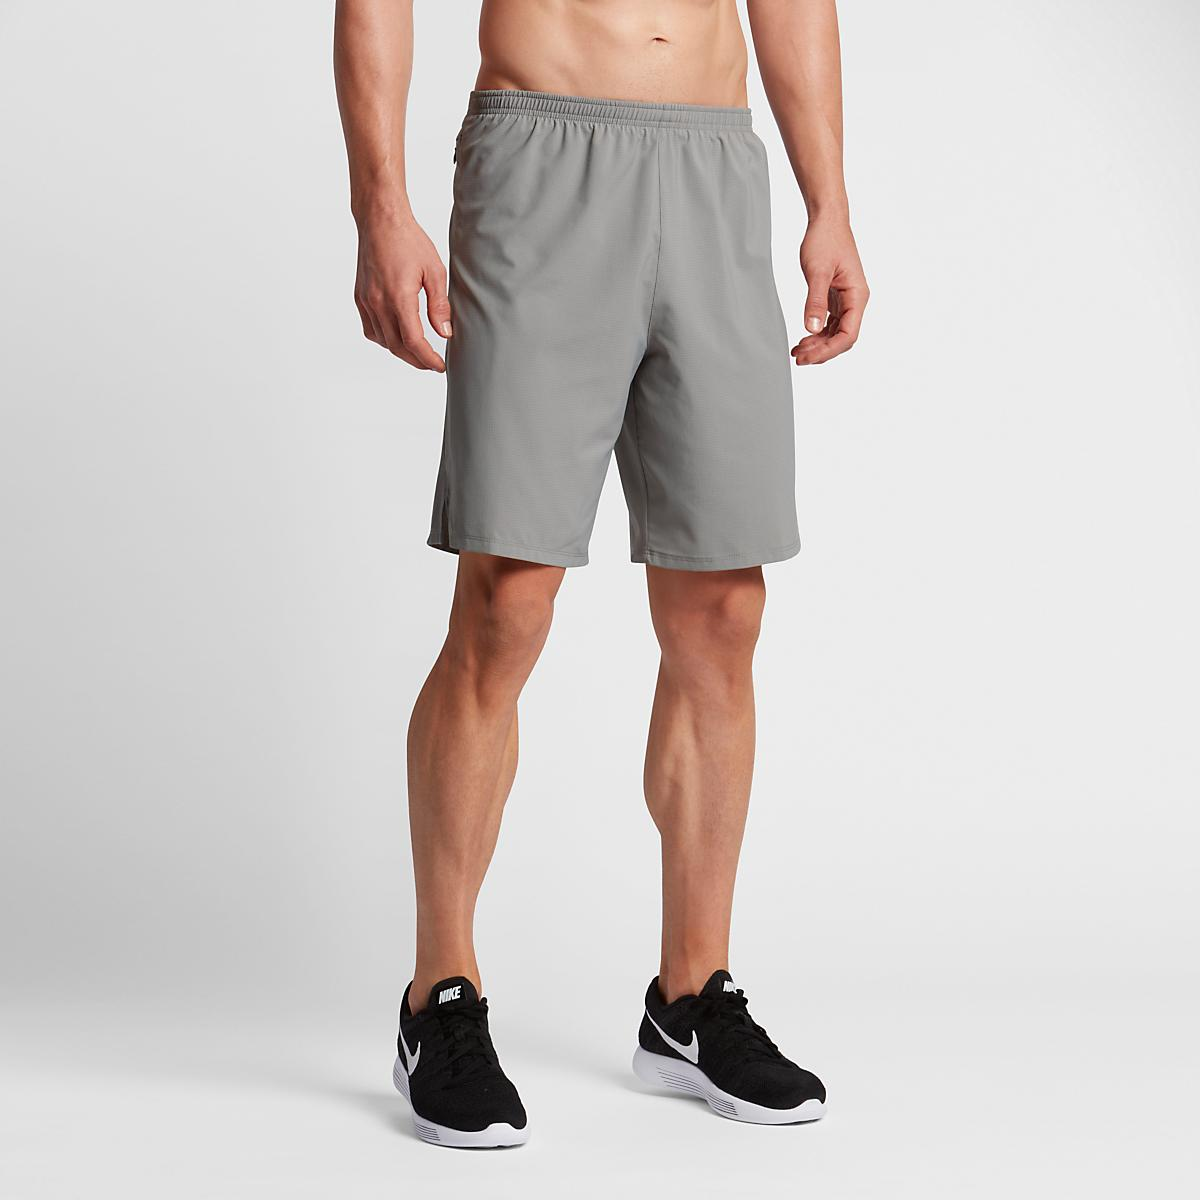 45a382135c4e8 Mens Nike Phenom 2-in-1 9